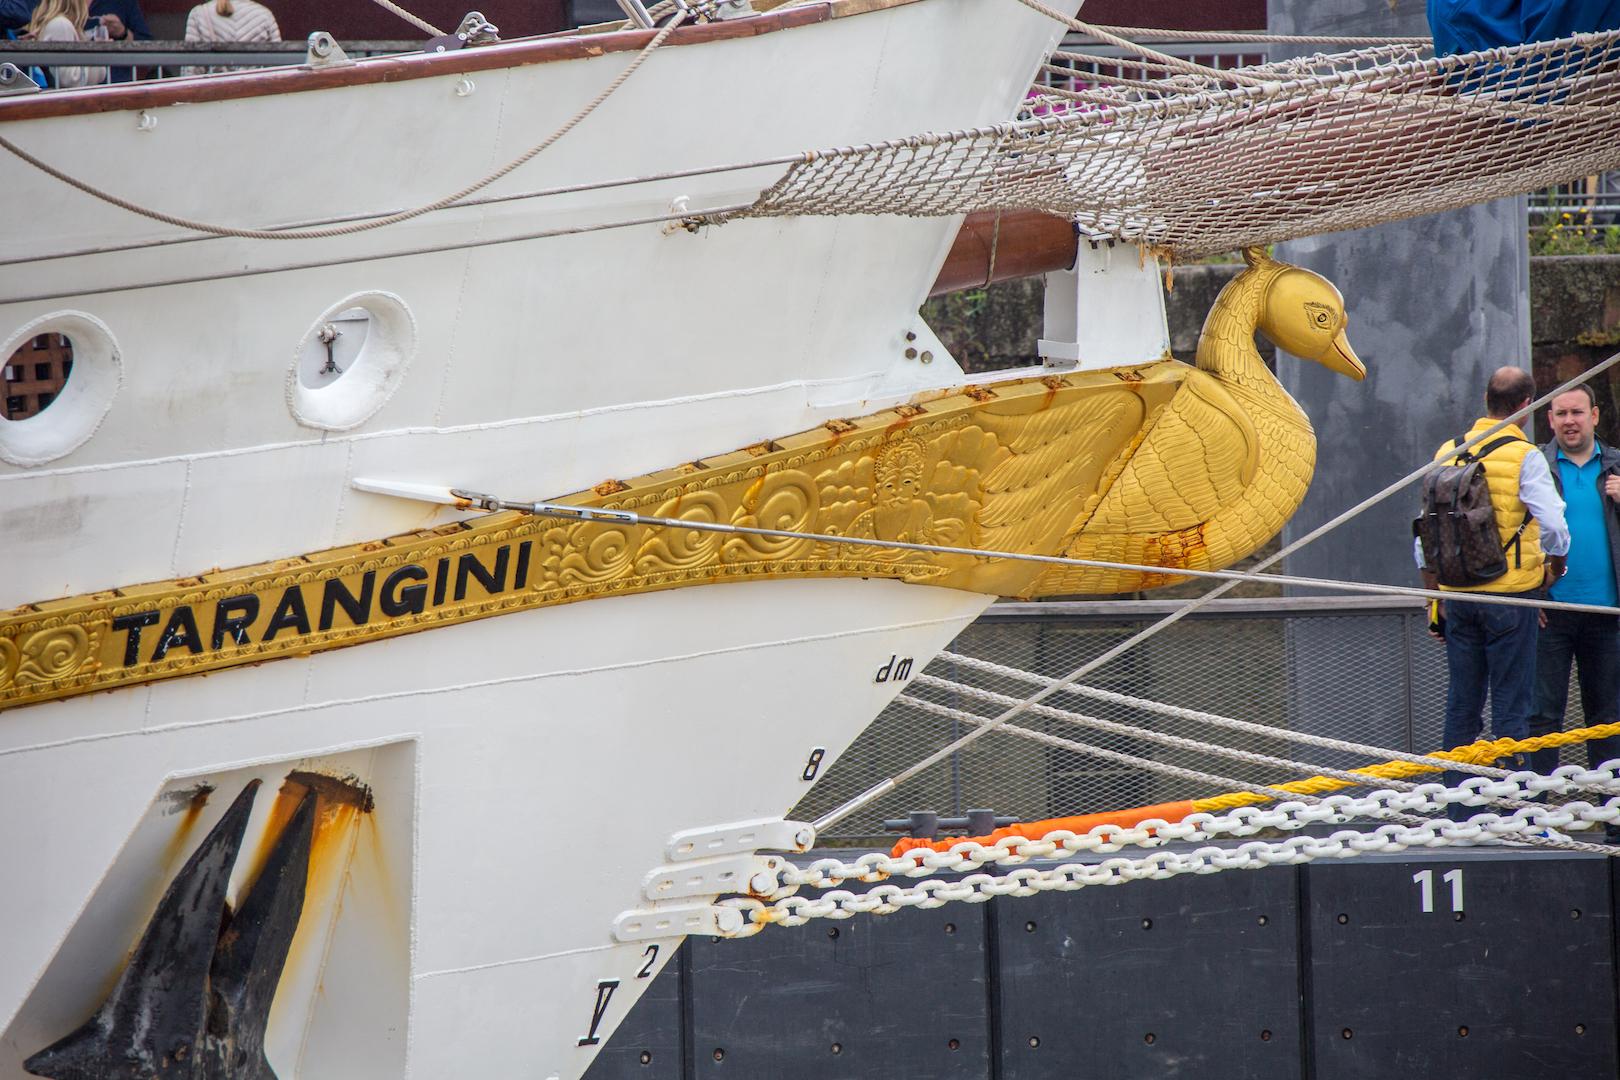 Tarangini Sail On Board Sailing Ship Diagram Tall Ships Pinterest Figurehead